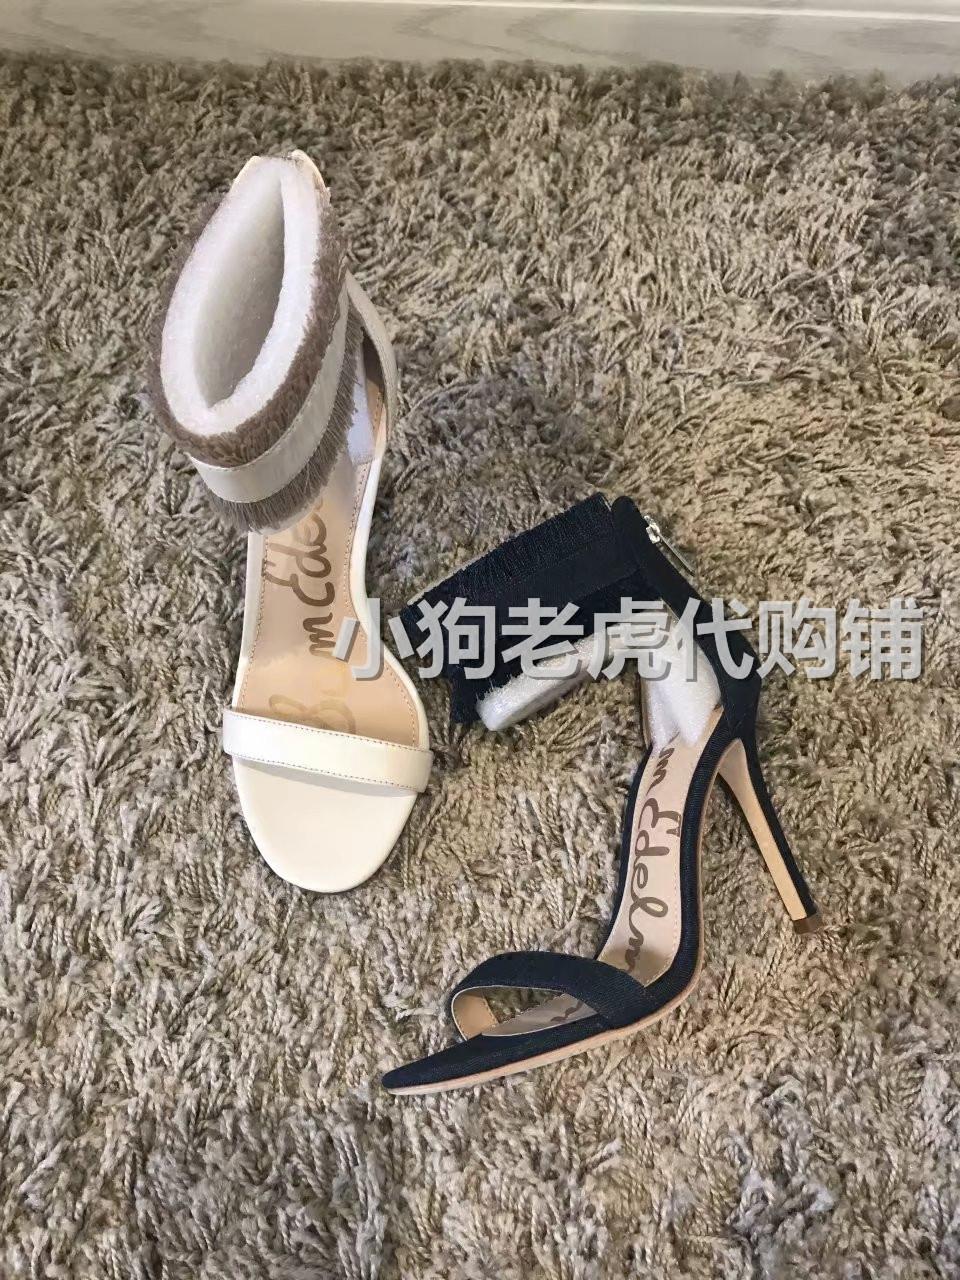 Sam Edelman anabeth ankle tassel high heel back zipper sandals